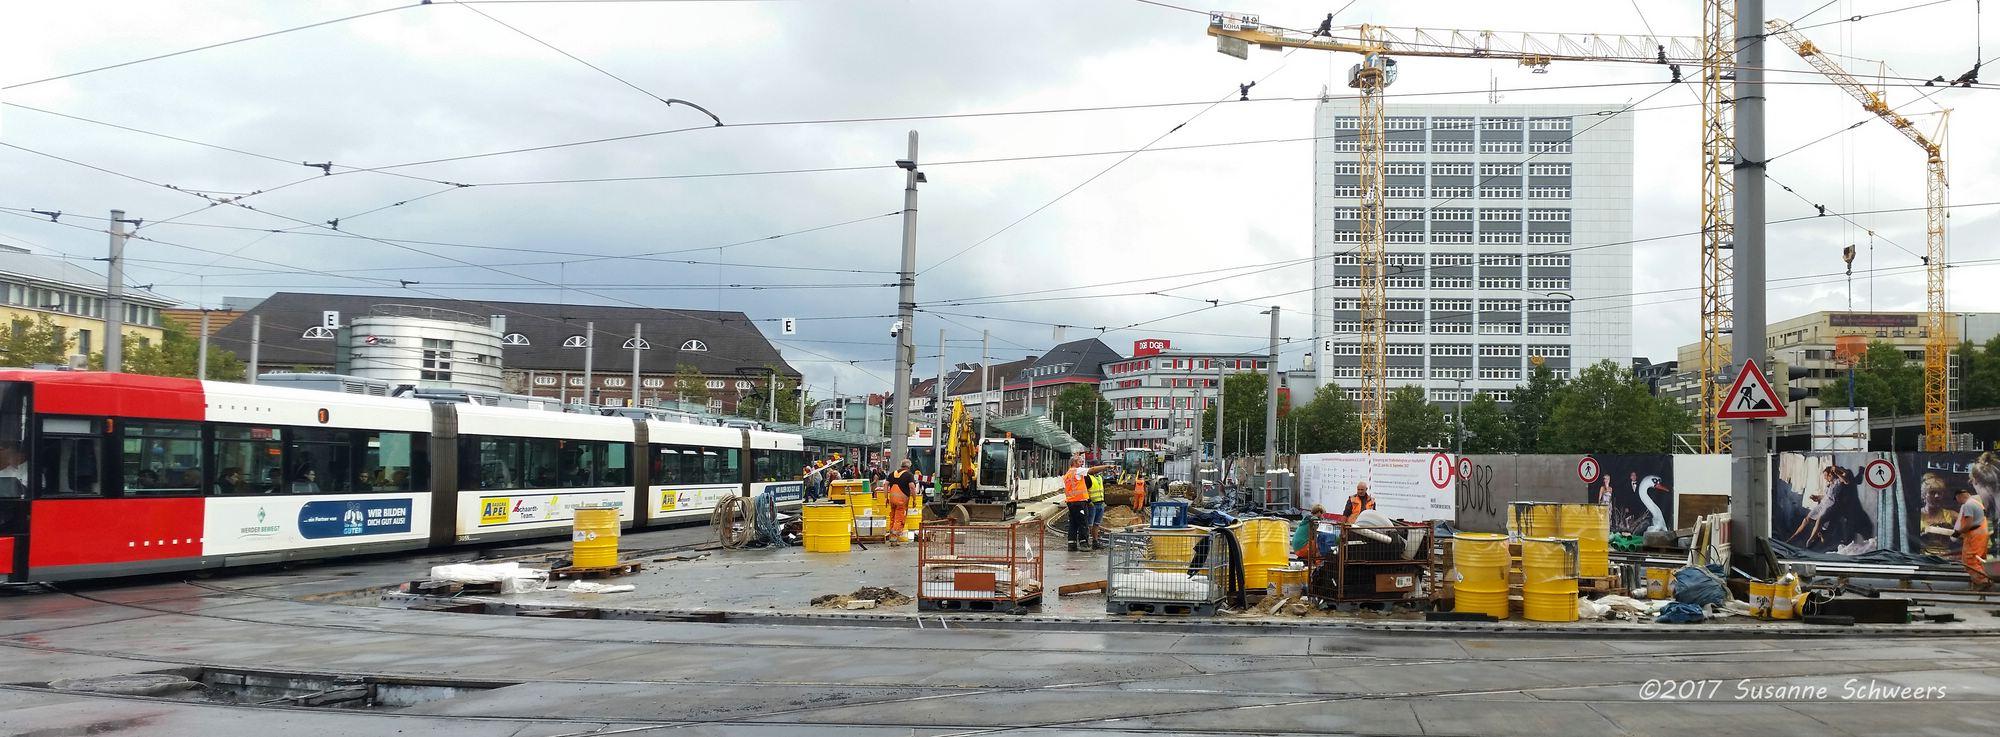 Baustelle Bahnhofsplatz 160